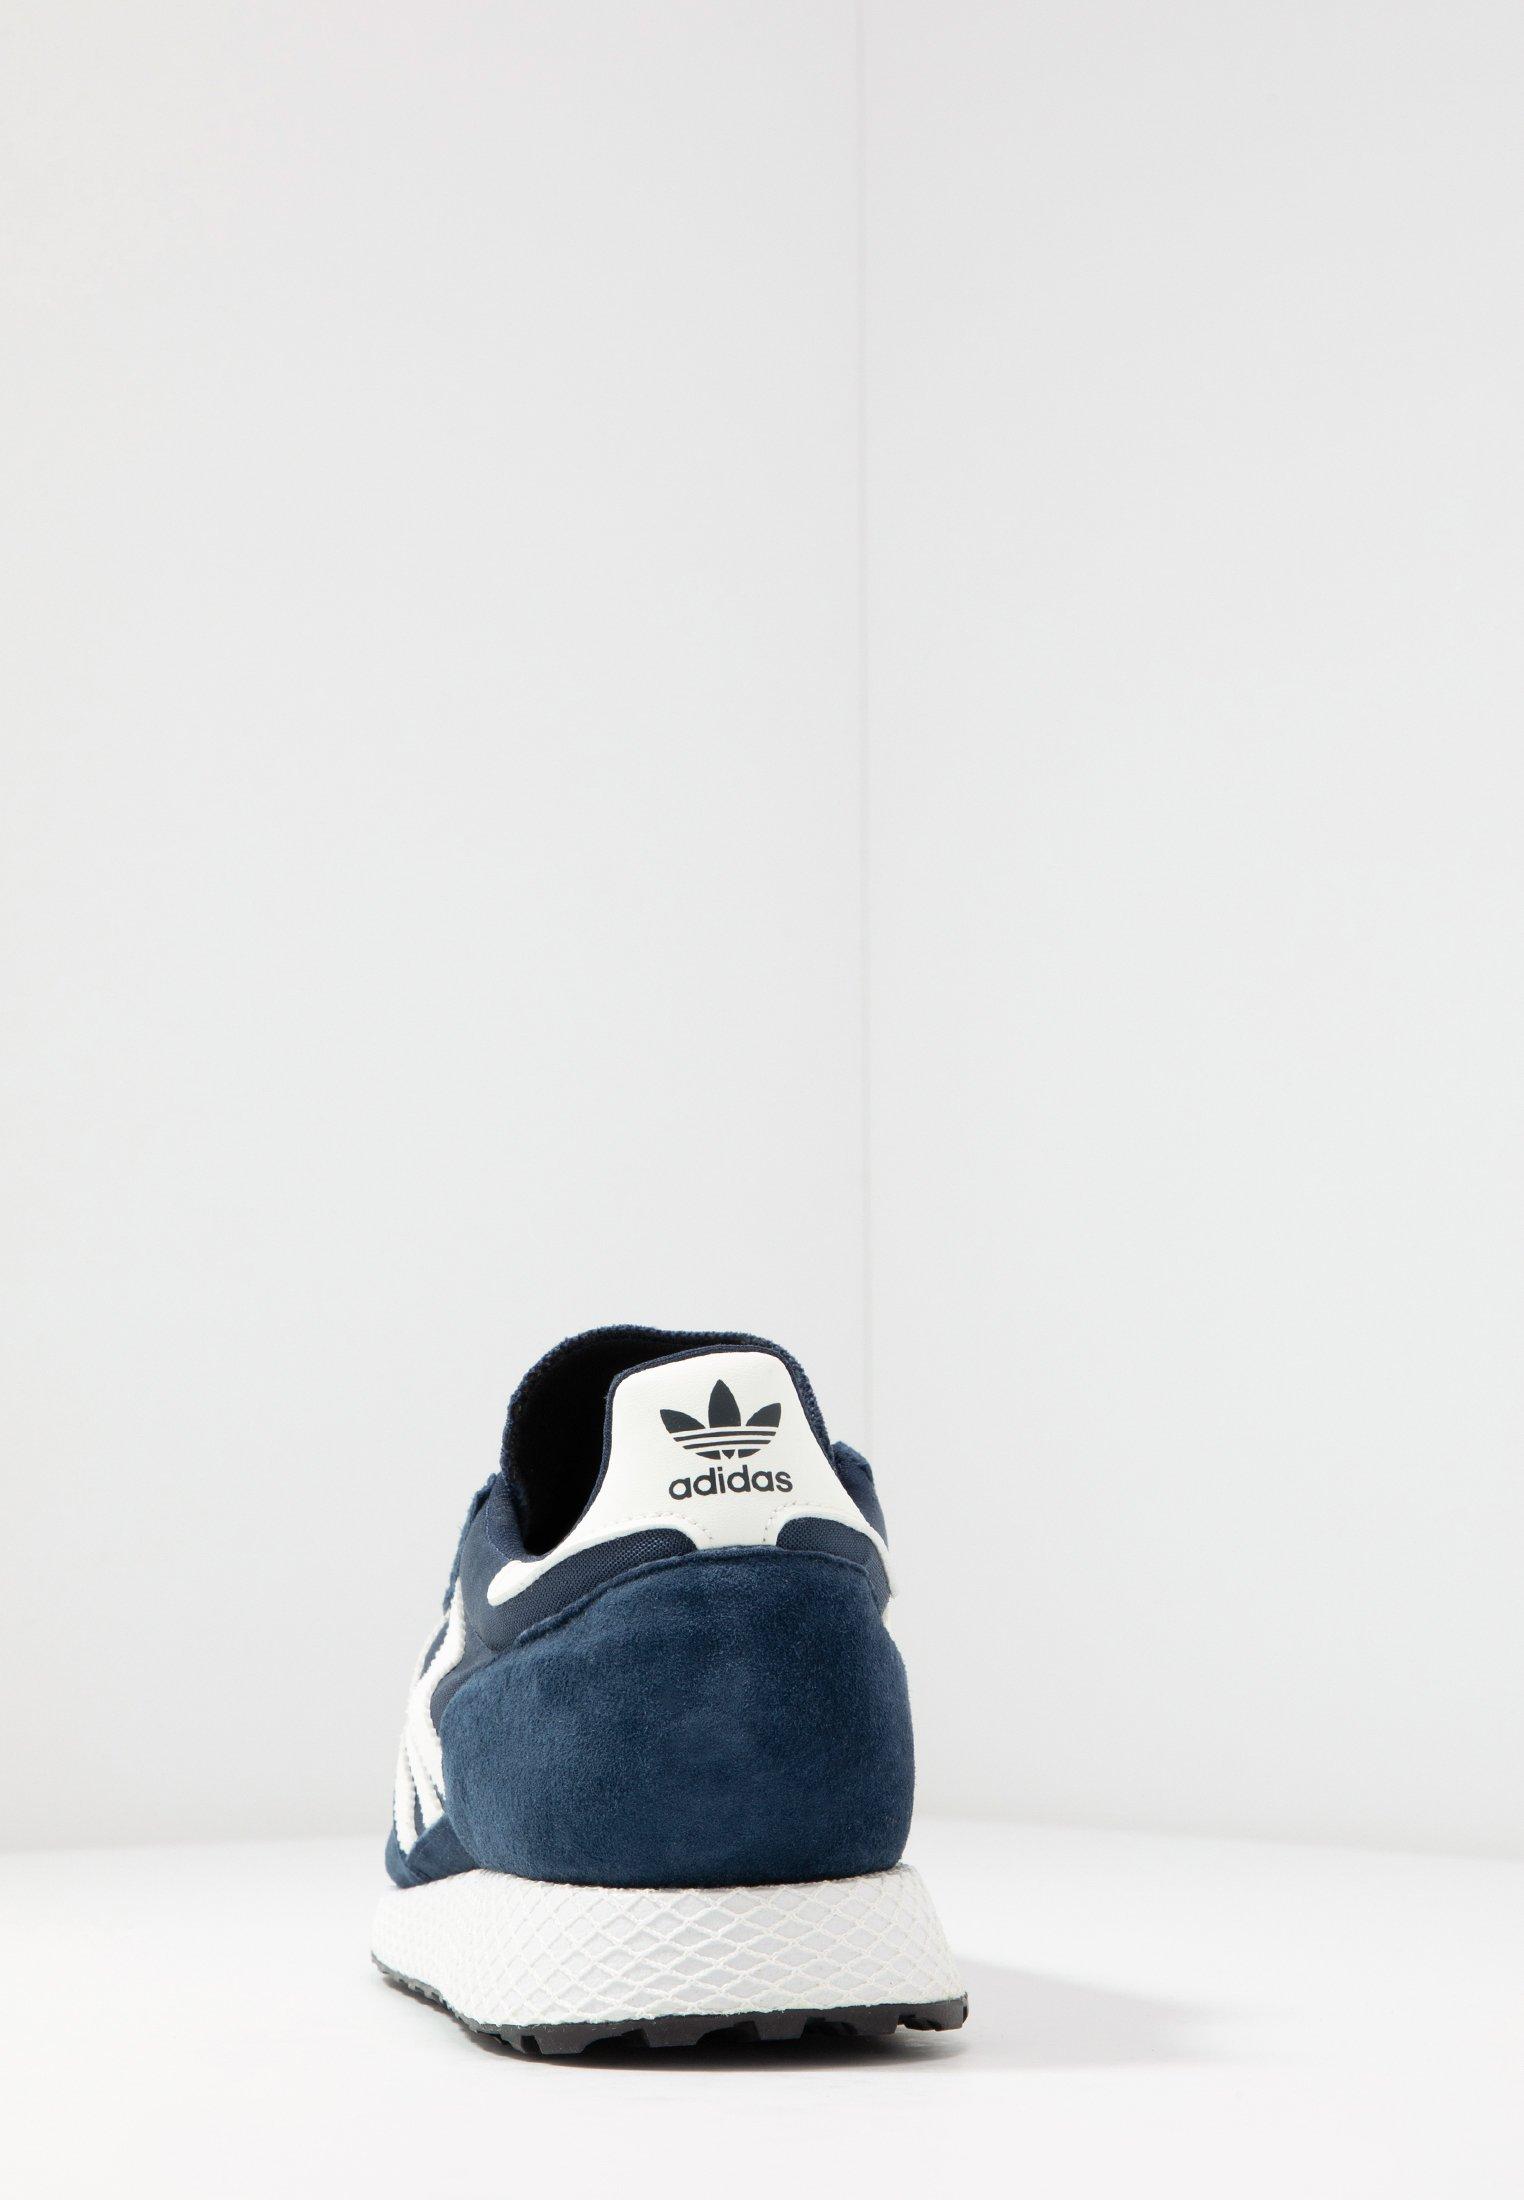 adidas Originals FOREST GROVE - Sneakers - collegiate navy/cloud white/core black